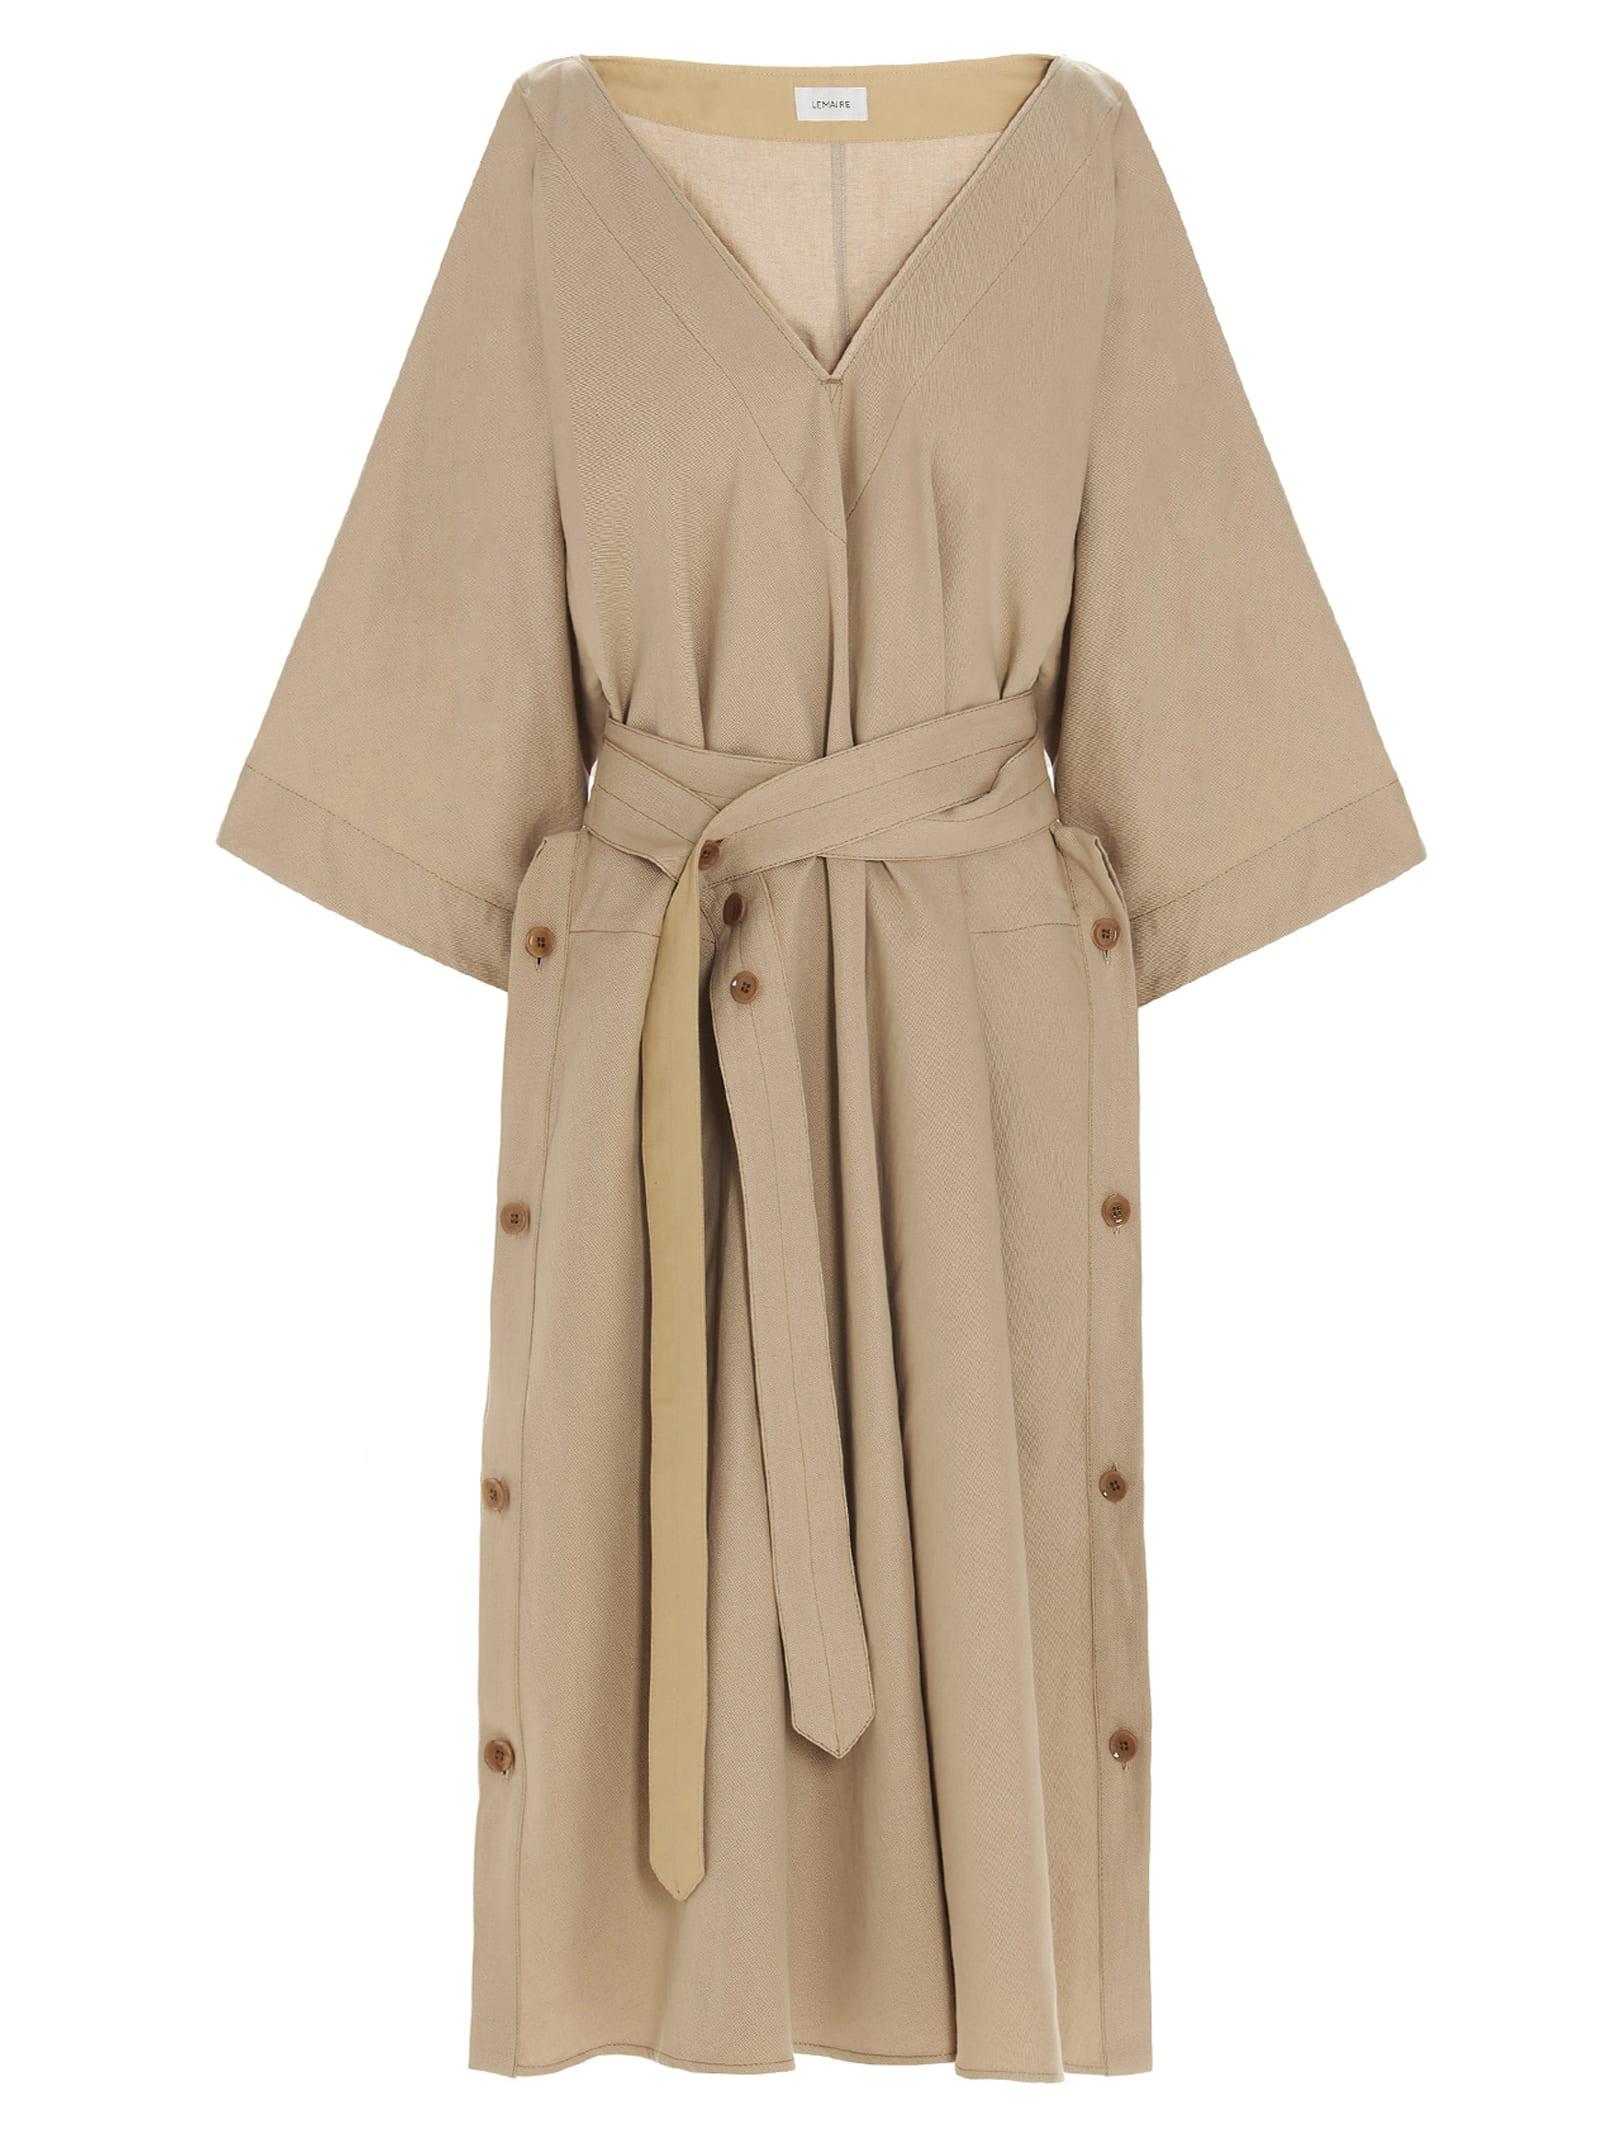 Lemaire Clothing VAREUSE DRESS